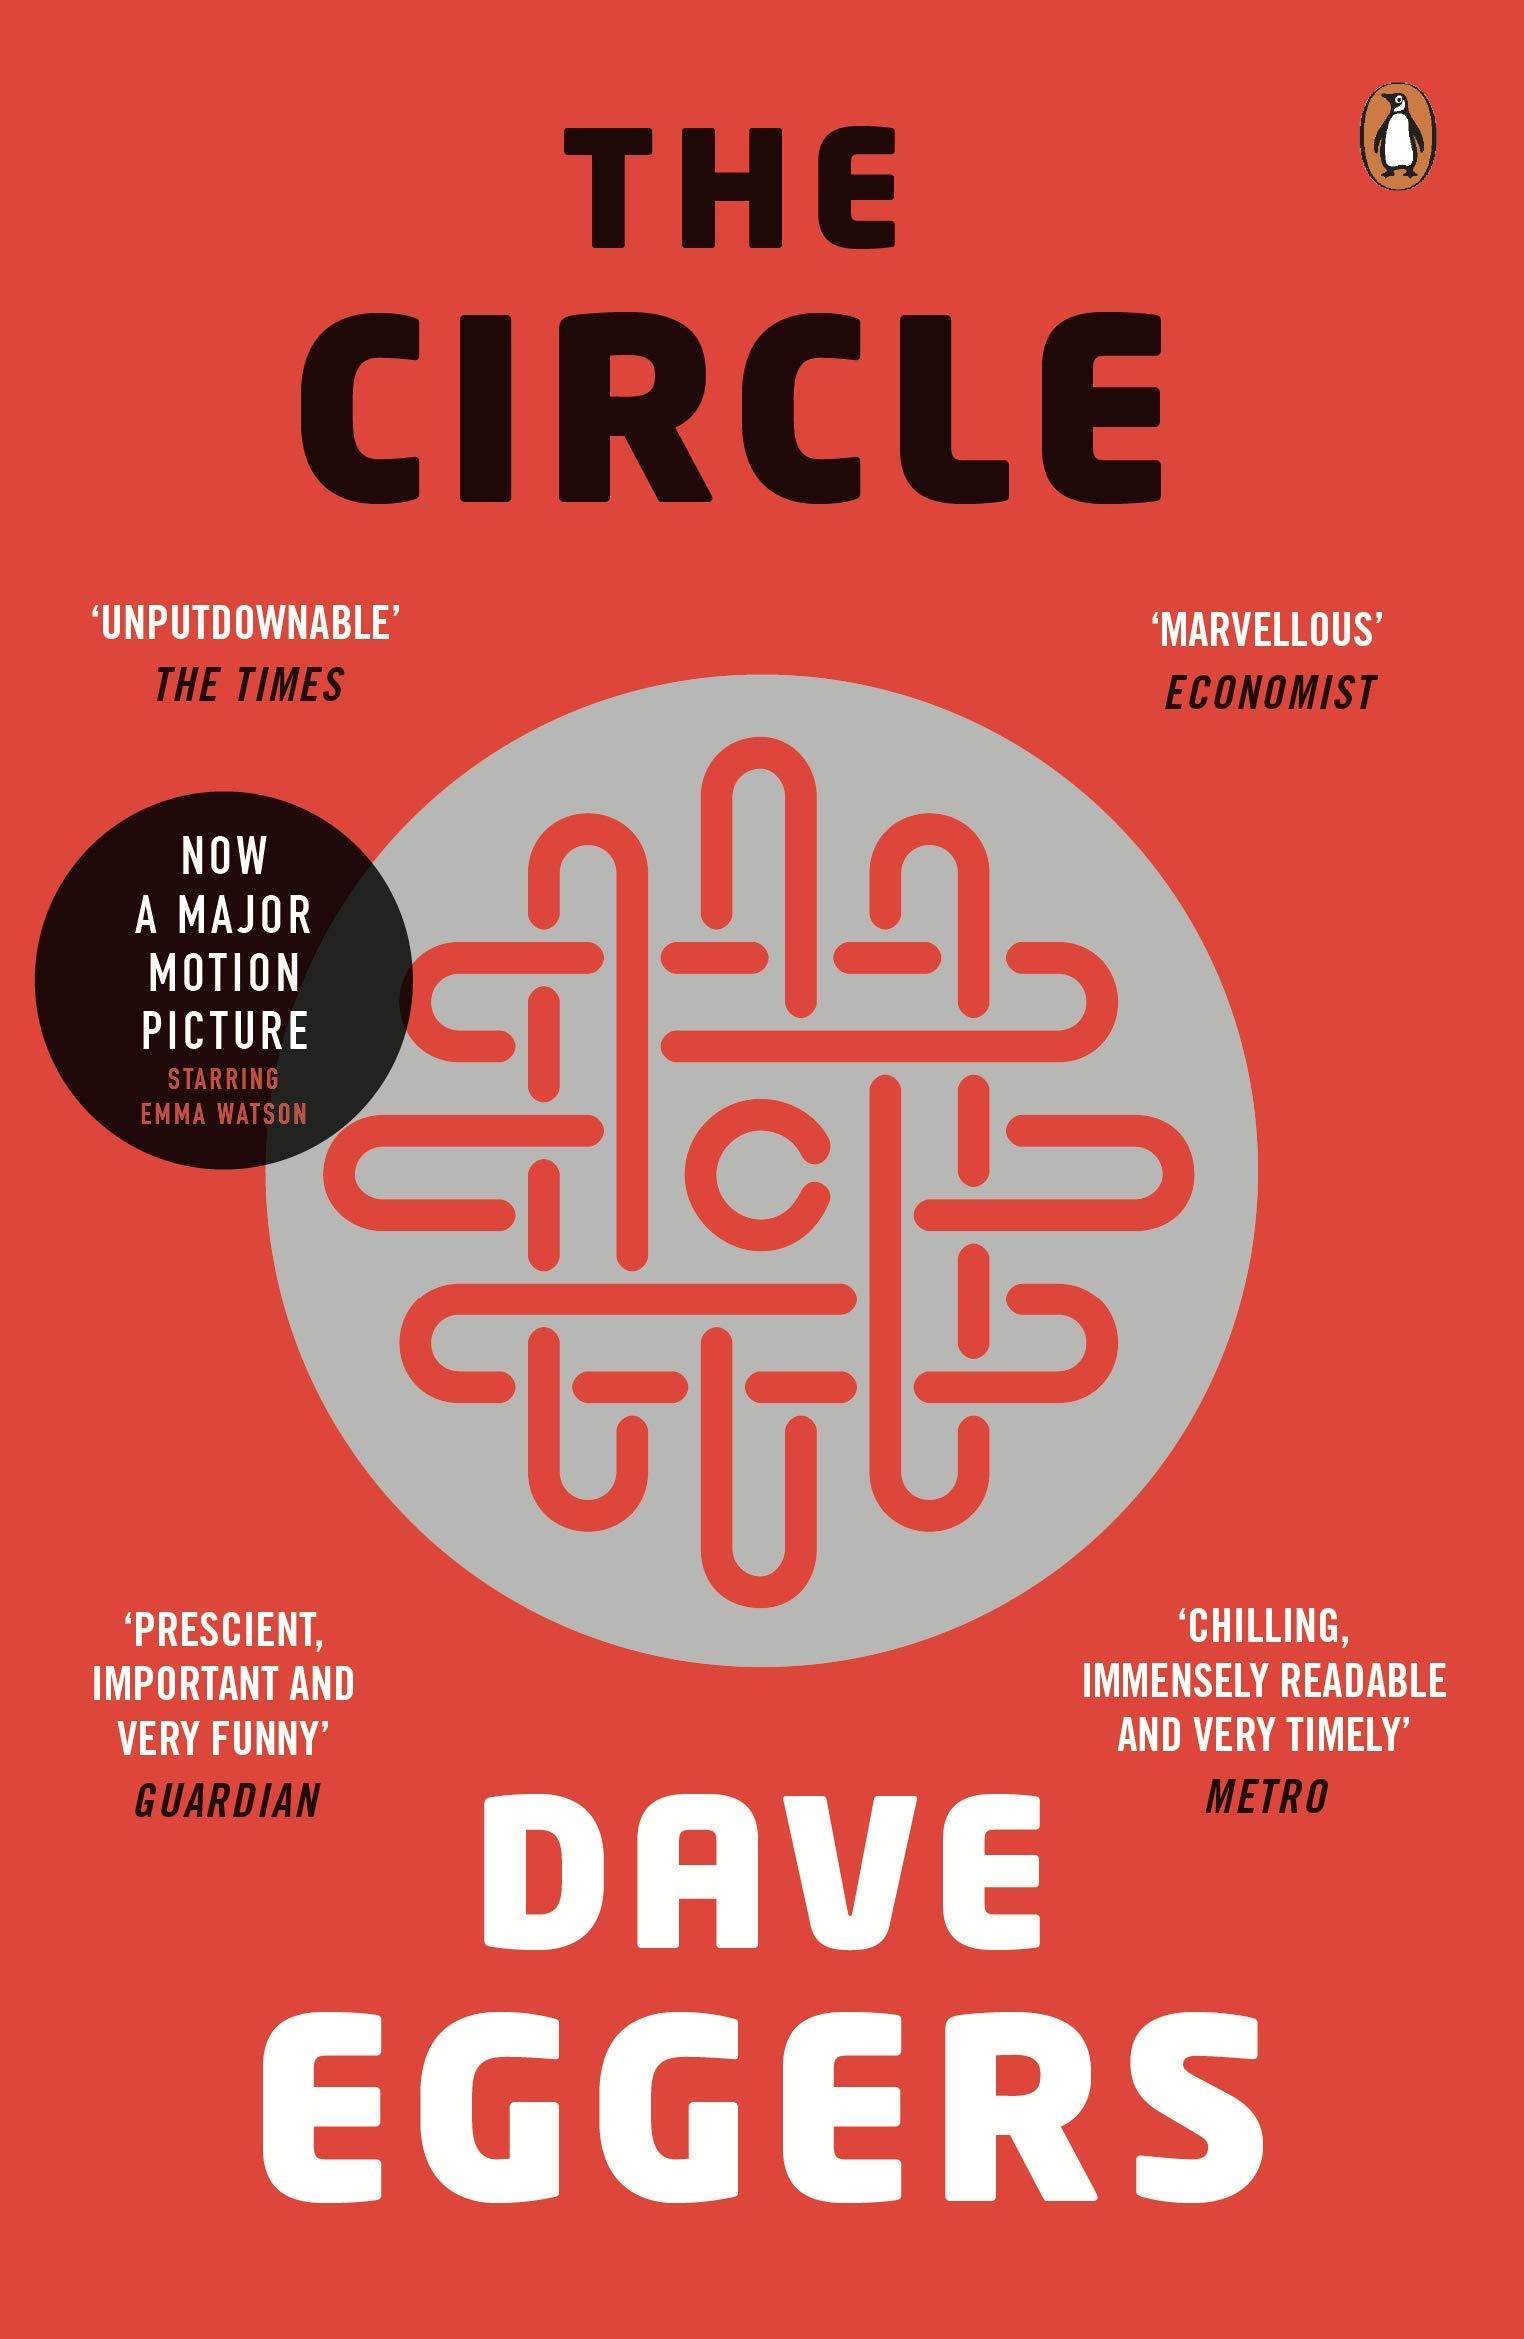 The Circle (Penguin Essentials): Amazon.co.uk: Eggers, Dave: 9780241146507:  Books